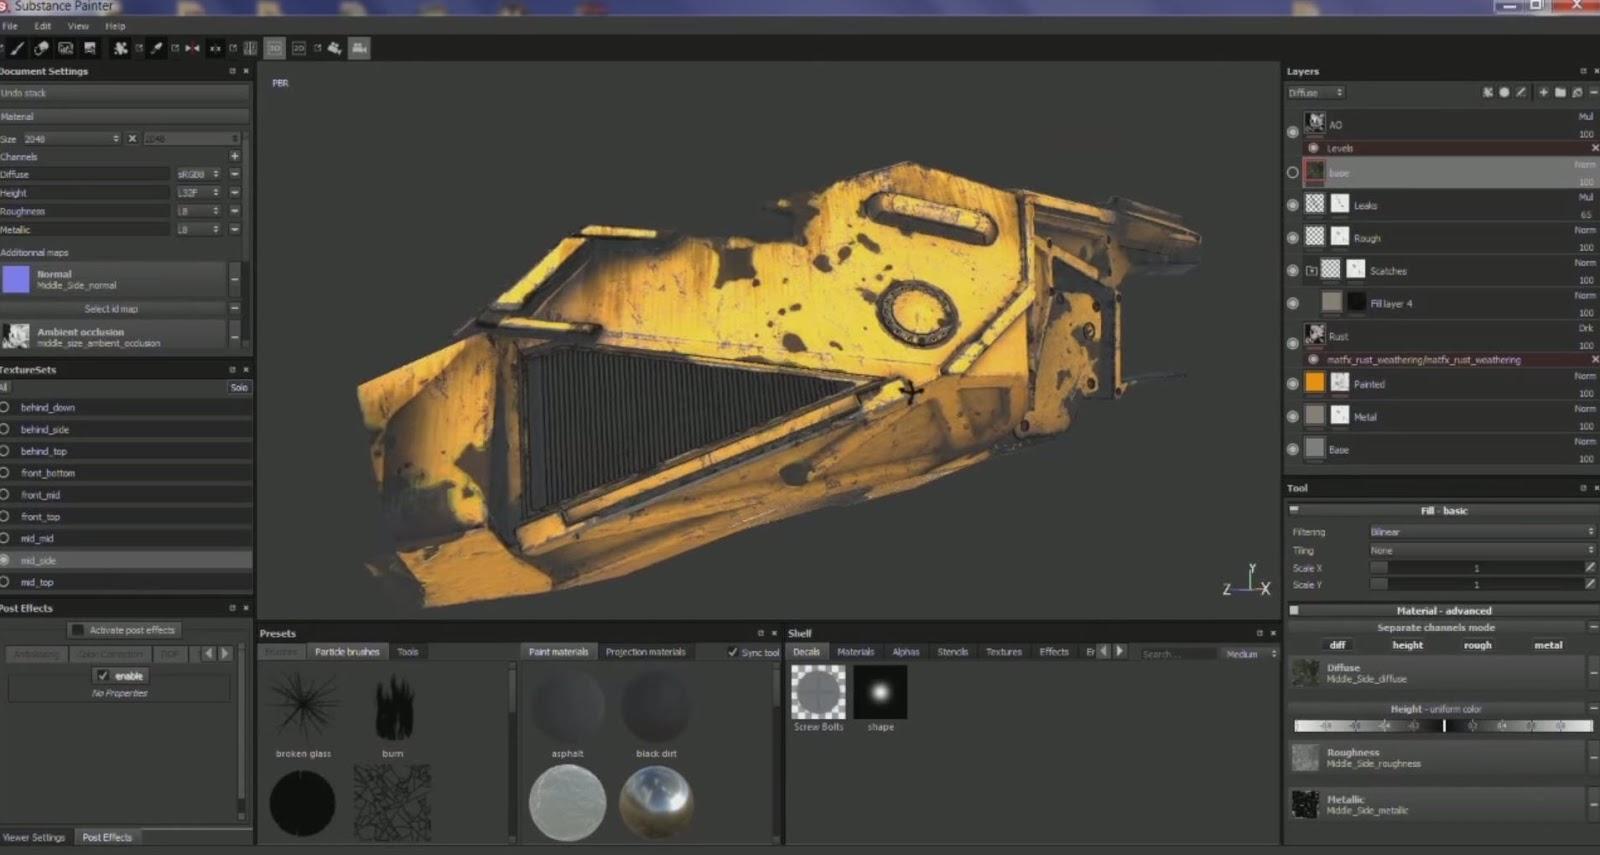 Allegorithmic Substance Painter for UE4 Plugin Overview | CG TUTORIAL